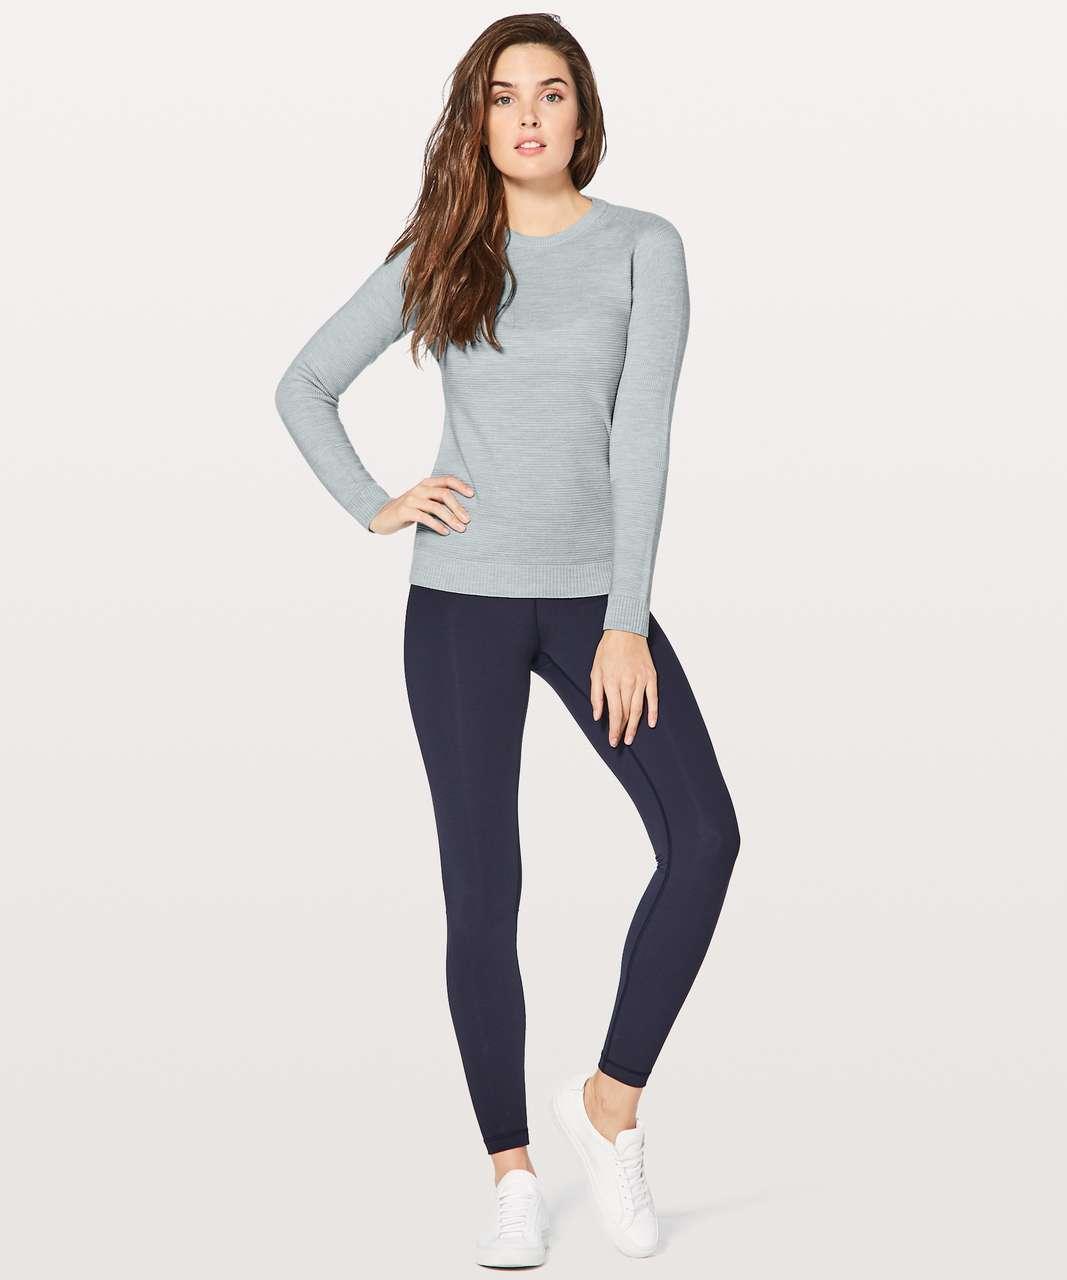 Lululemon Simply Wool Sweater - Heathered Starlight